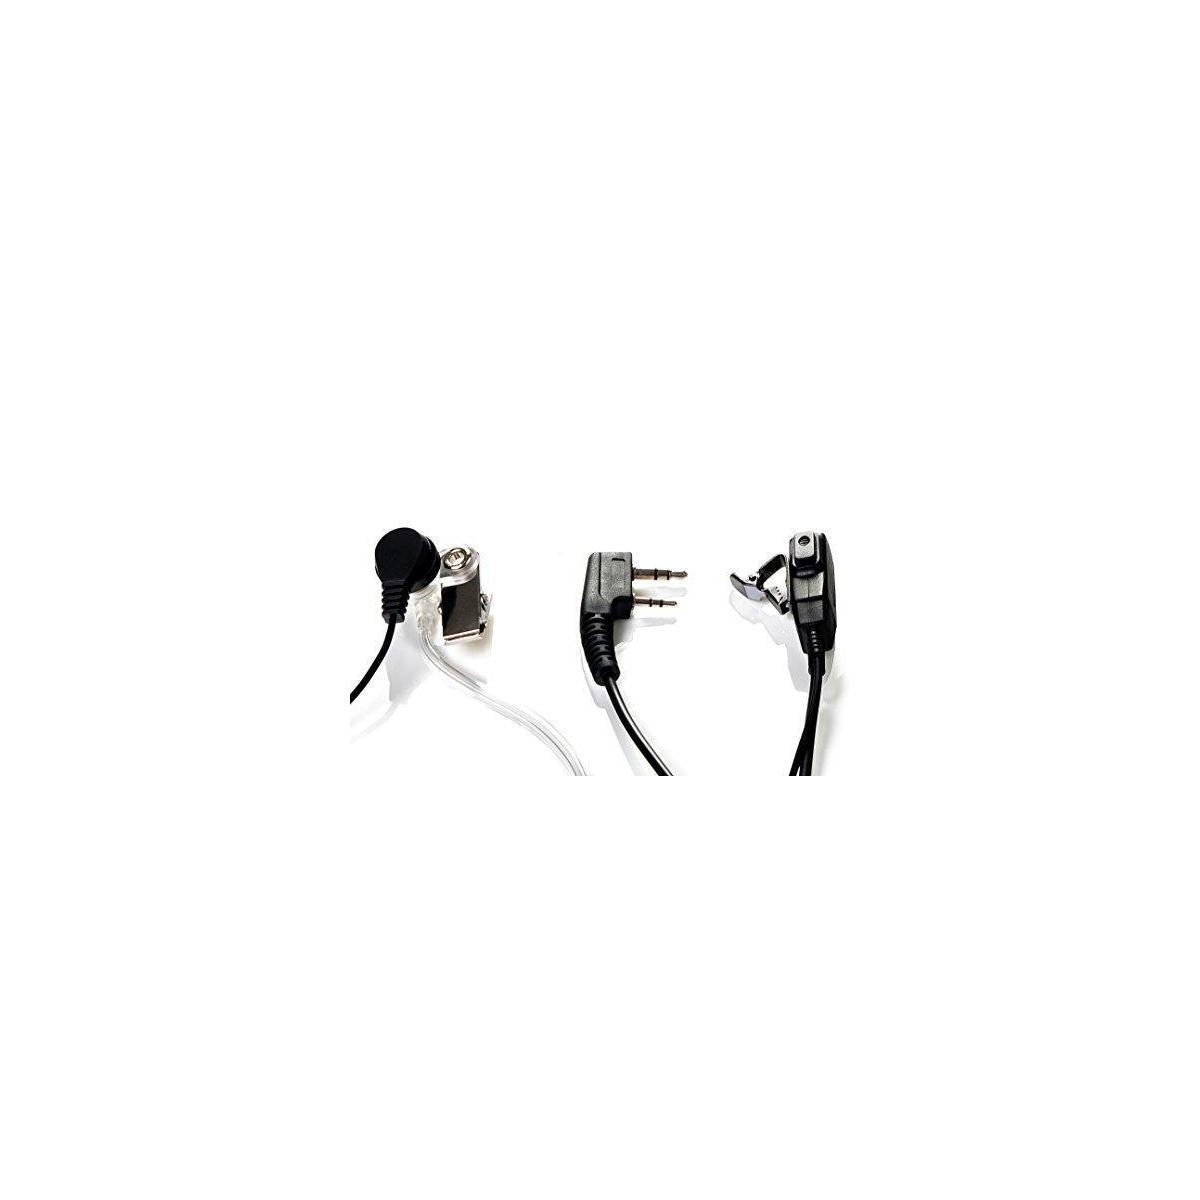 Radio earpiece 2-Pin, (4 Pack) Covert Acoustic Tube,  Walkie Talkie Headset for Kenwood Baofeng Puxing Wouxun TYT Retevis Procter.